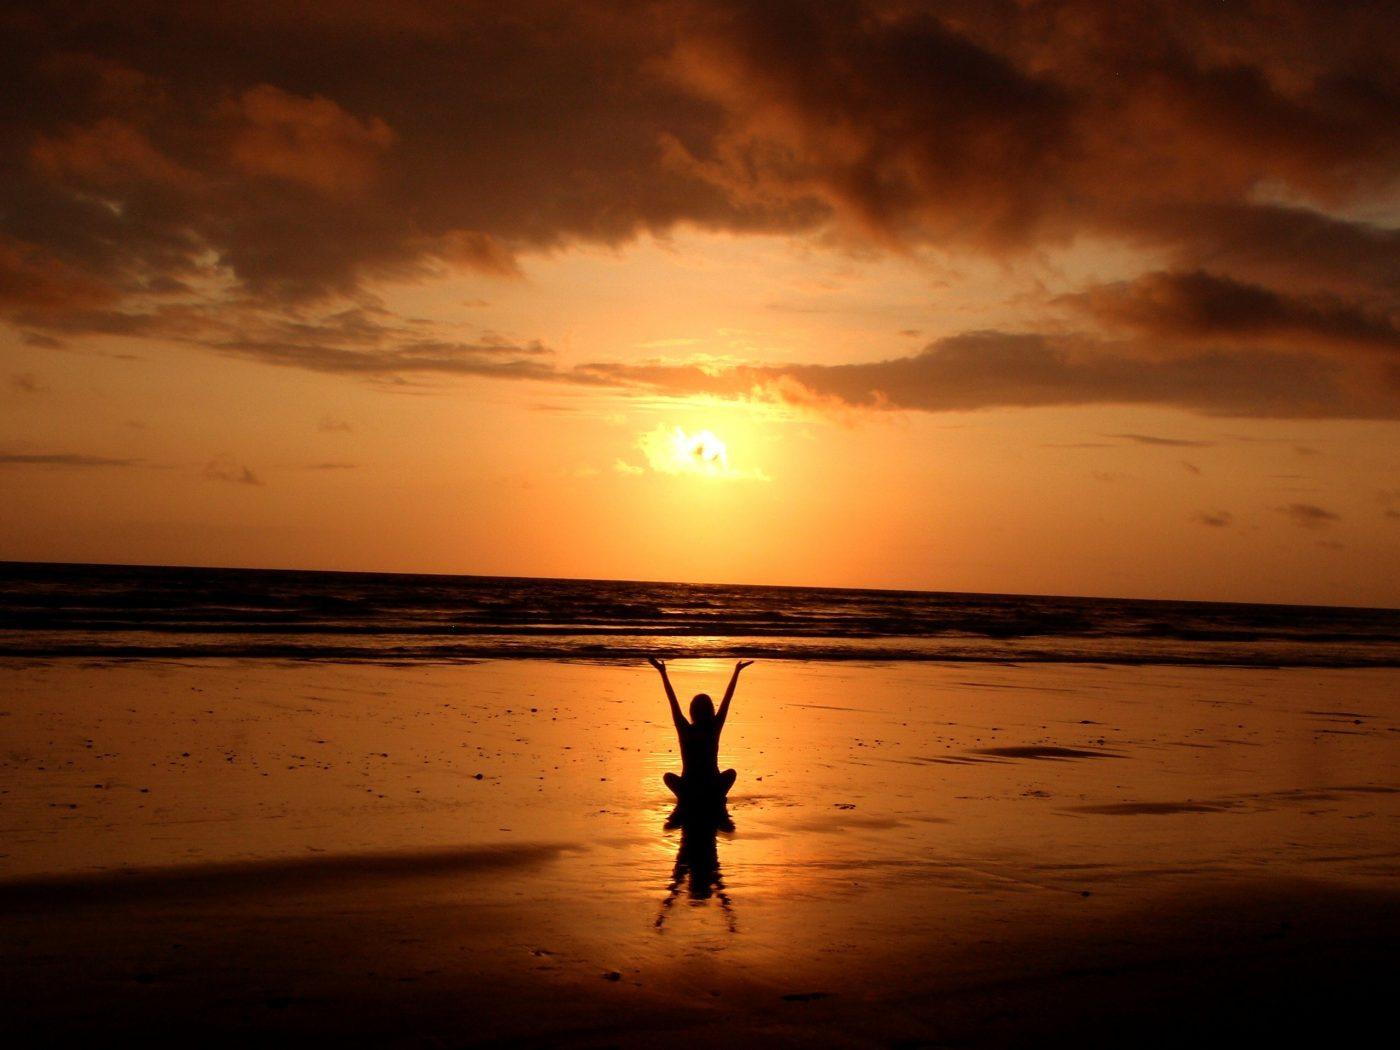 Minimalism: person enjoying the sunset at the beach